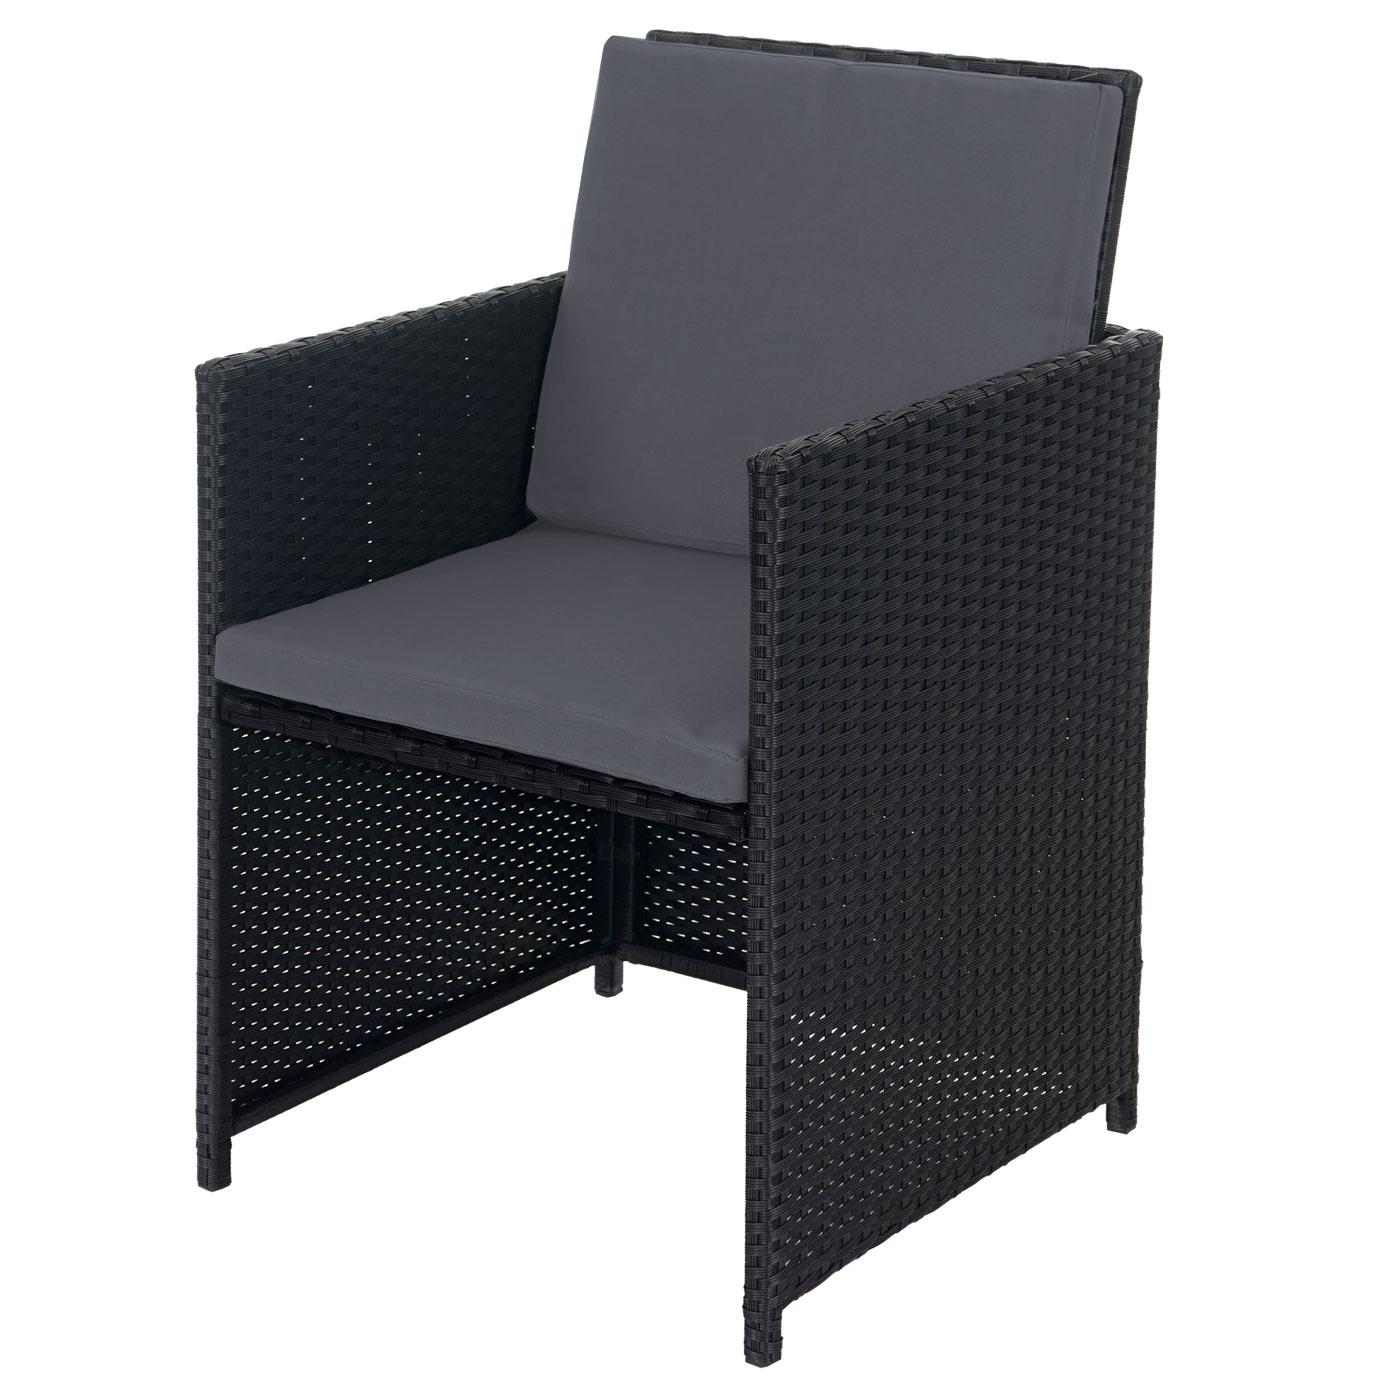 Rattan Lounge Schwarz Grau ~  Garnitur Kreta, LoungeSet Sitzgruppe ~ 4 Stühle schwarz, Kissen grau